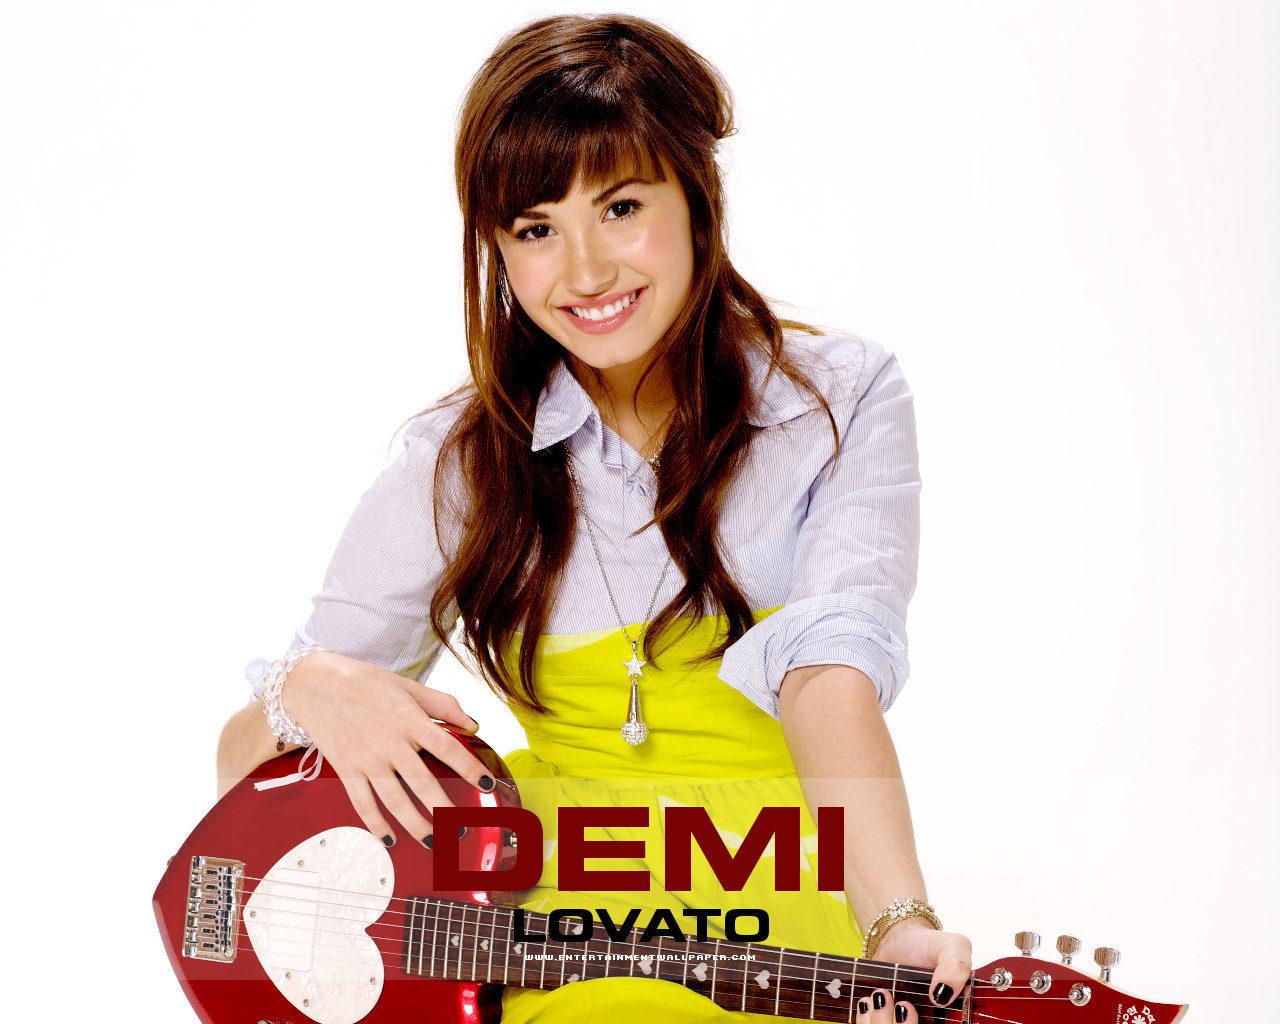 http://images2.fanpop.com/images/photos/8100000/demi-lovato-demi-lovato-8129765-1280-1024.jpg